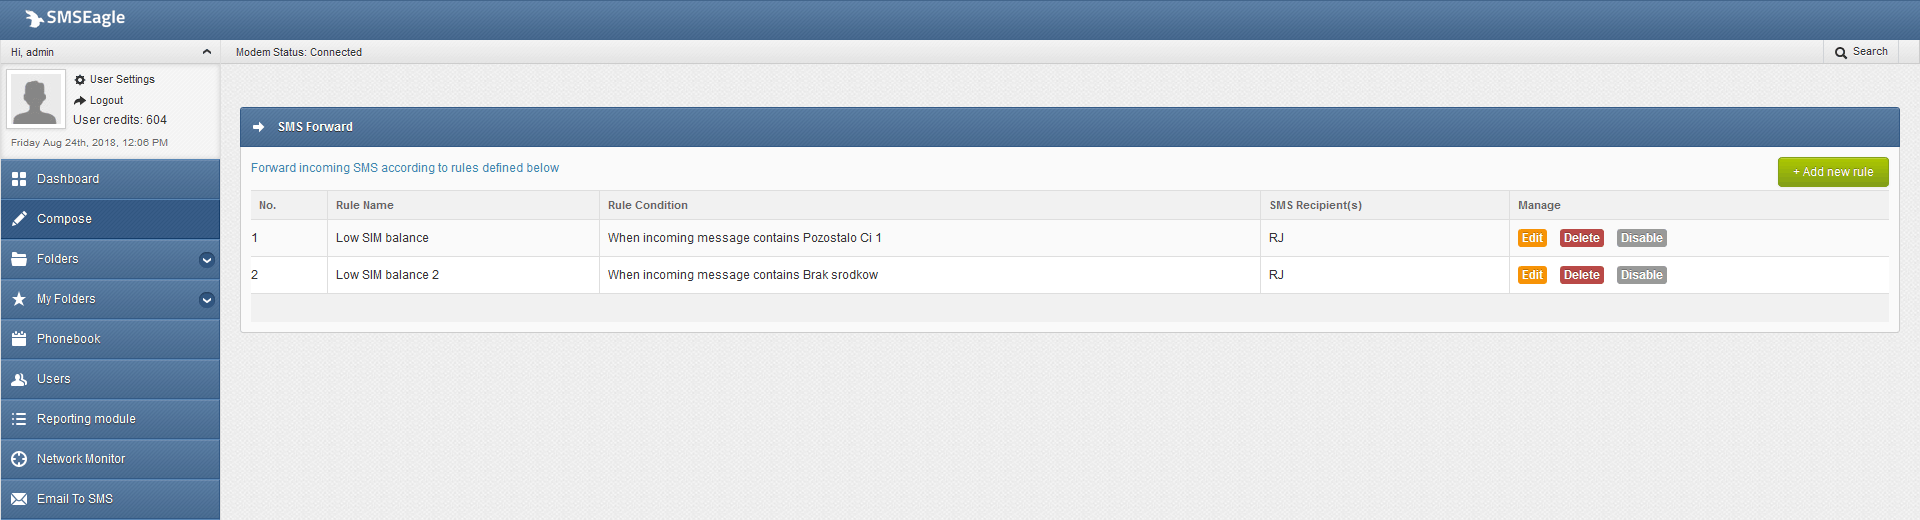 SMS Forward | SMSEagle